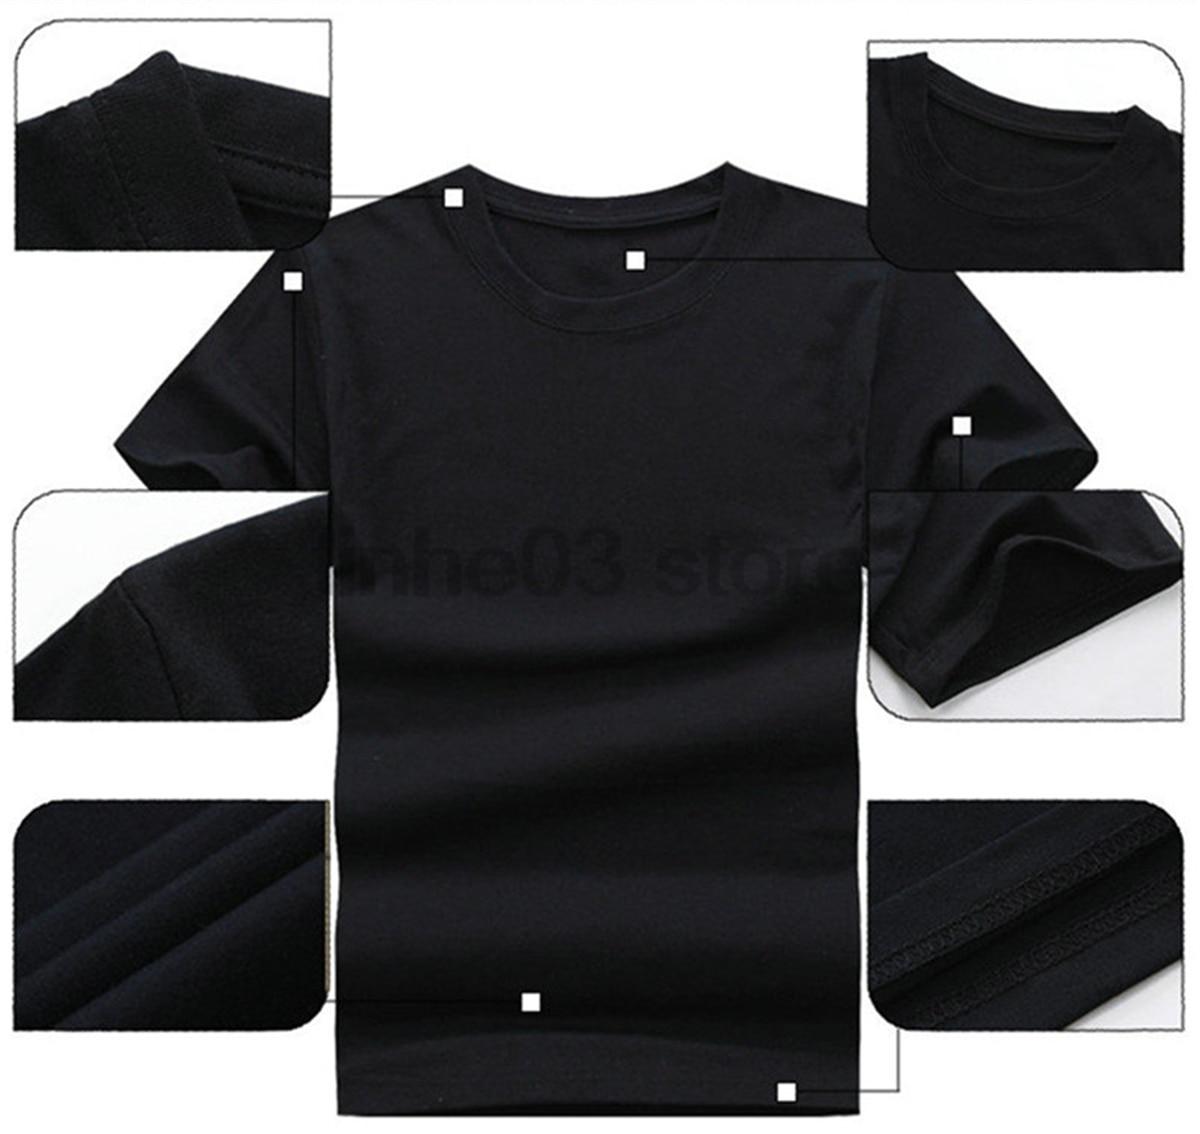 GILDAN T-Shirt Professional School Bus Driver Wild Vintage Look Hot Womens T-shirt Mothers Day Ms. T-shirt